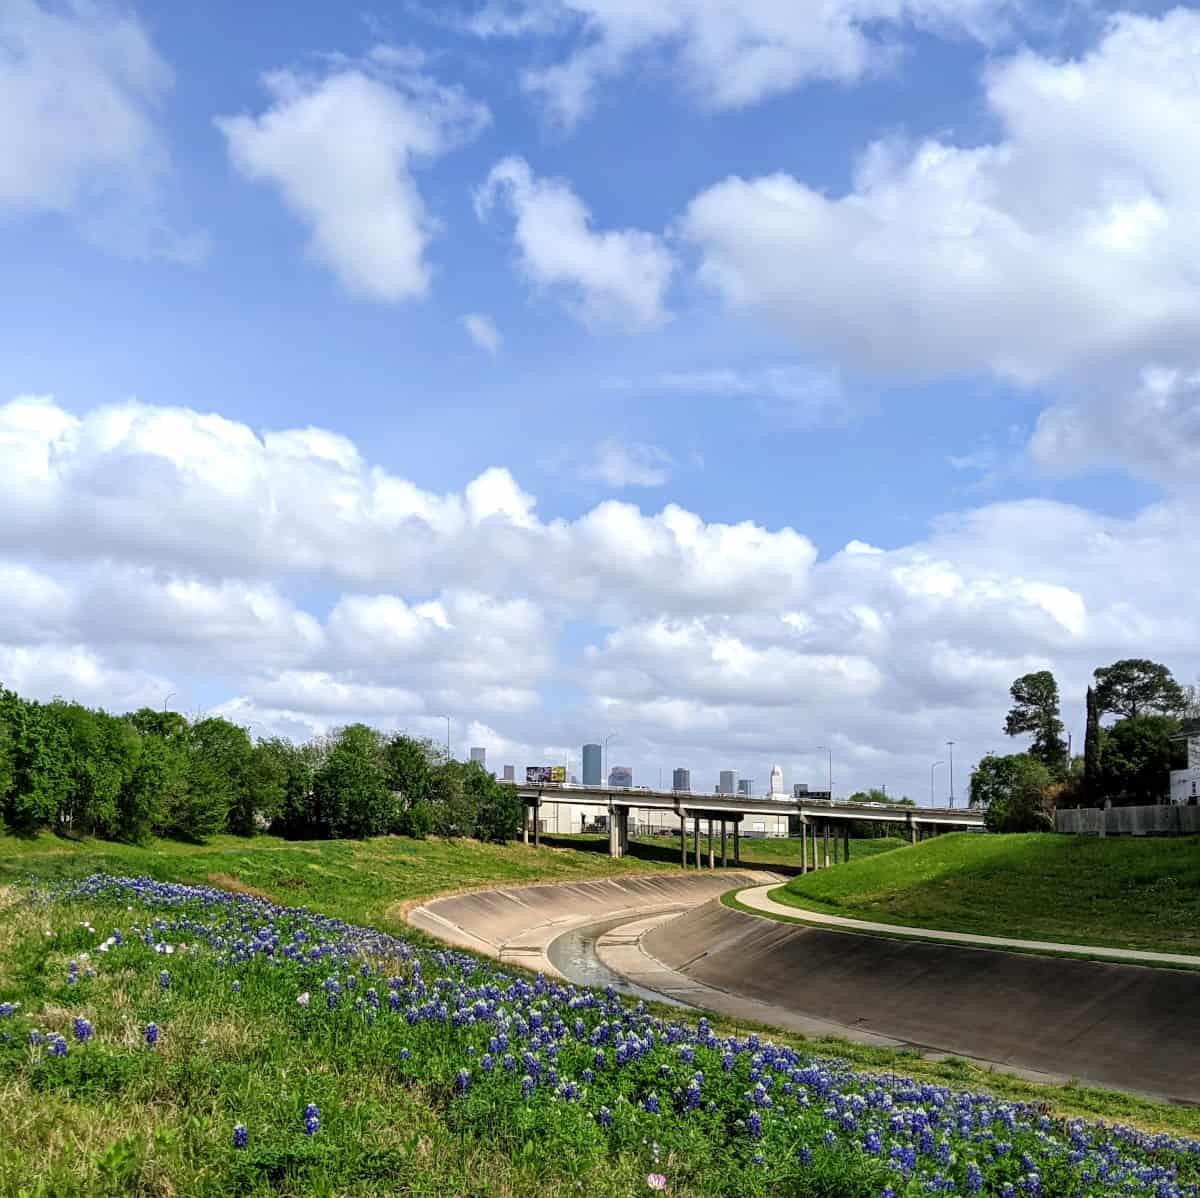 Bluebonnets at White Oak Bayou